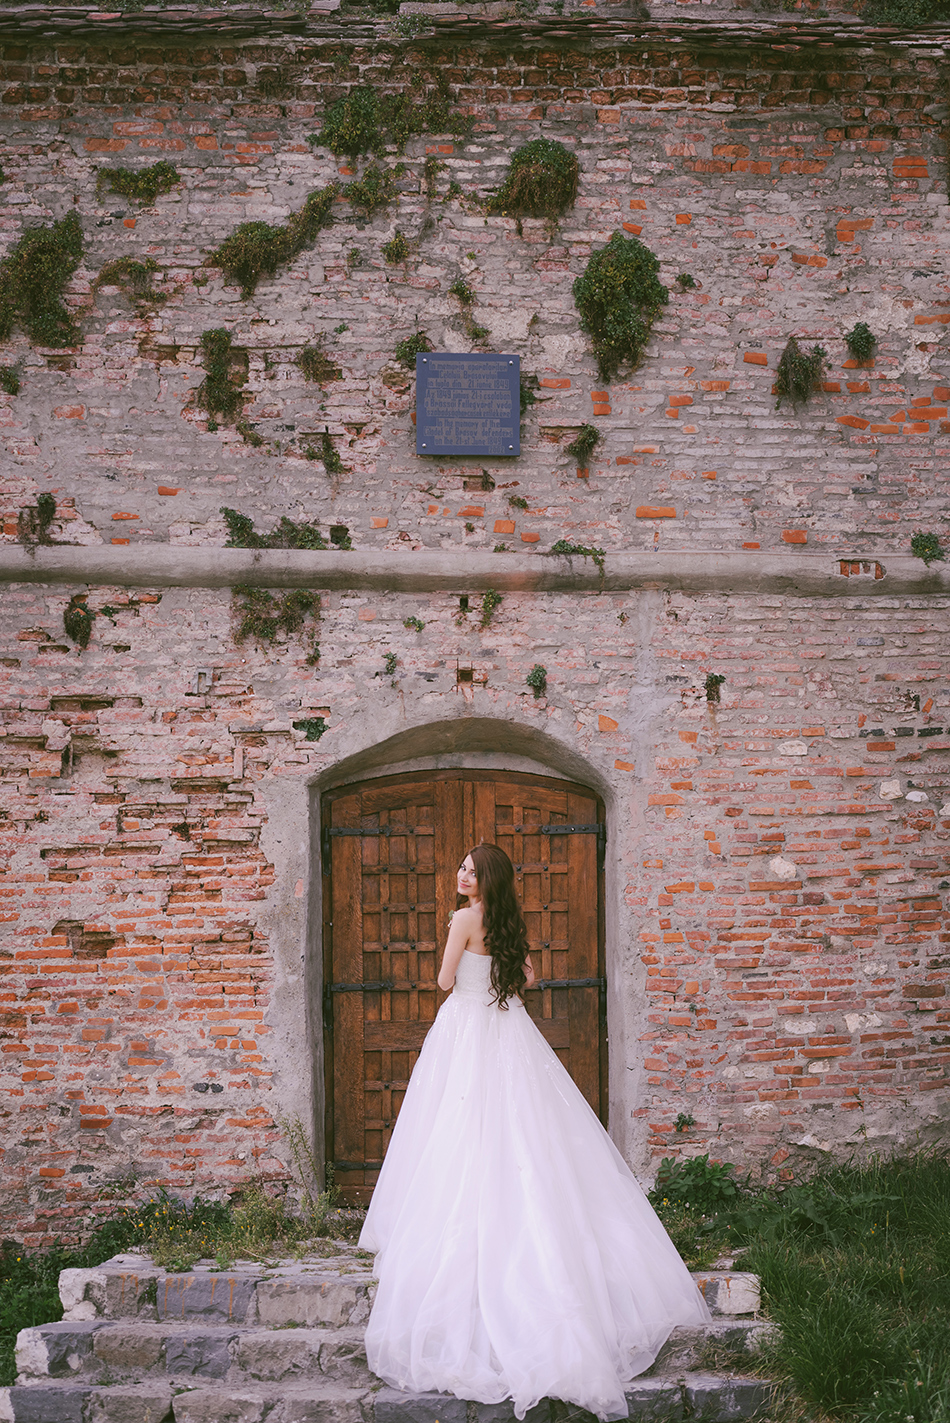 AD Passion Photography | fotograf-nunta-brasov-poiana-brasov-fotograf-profesionist_lorena-cristi_ttd_0006 | Adelin, Dida, fotograf profesionist, fotograf de nunta, fotografie de nunta, fotograf Timisoara, fotograf Craiova, fotograf Bucuresti, fotograf Arad, nunta Timisoara, nunta Arad, nunta Bucuresti, nunta Craiova